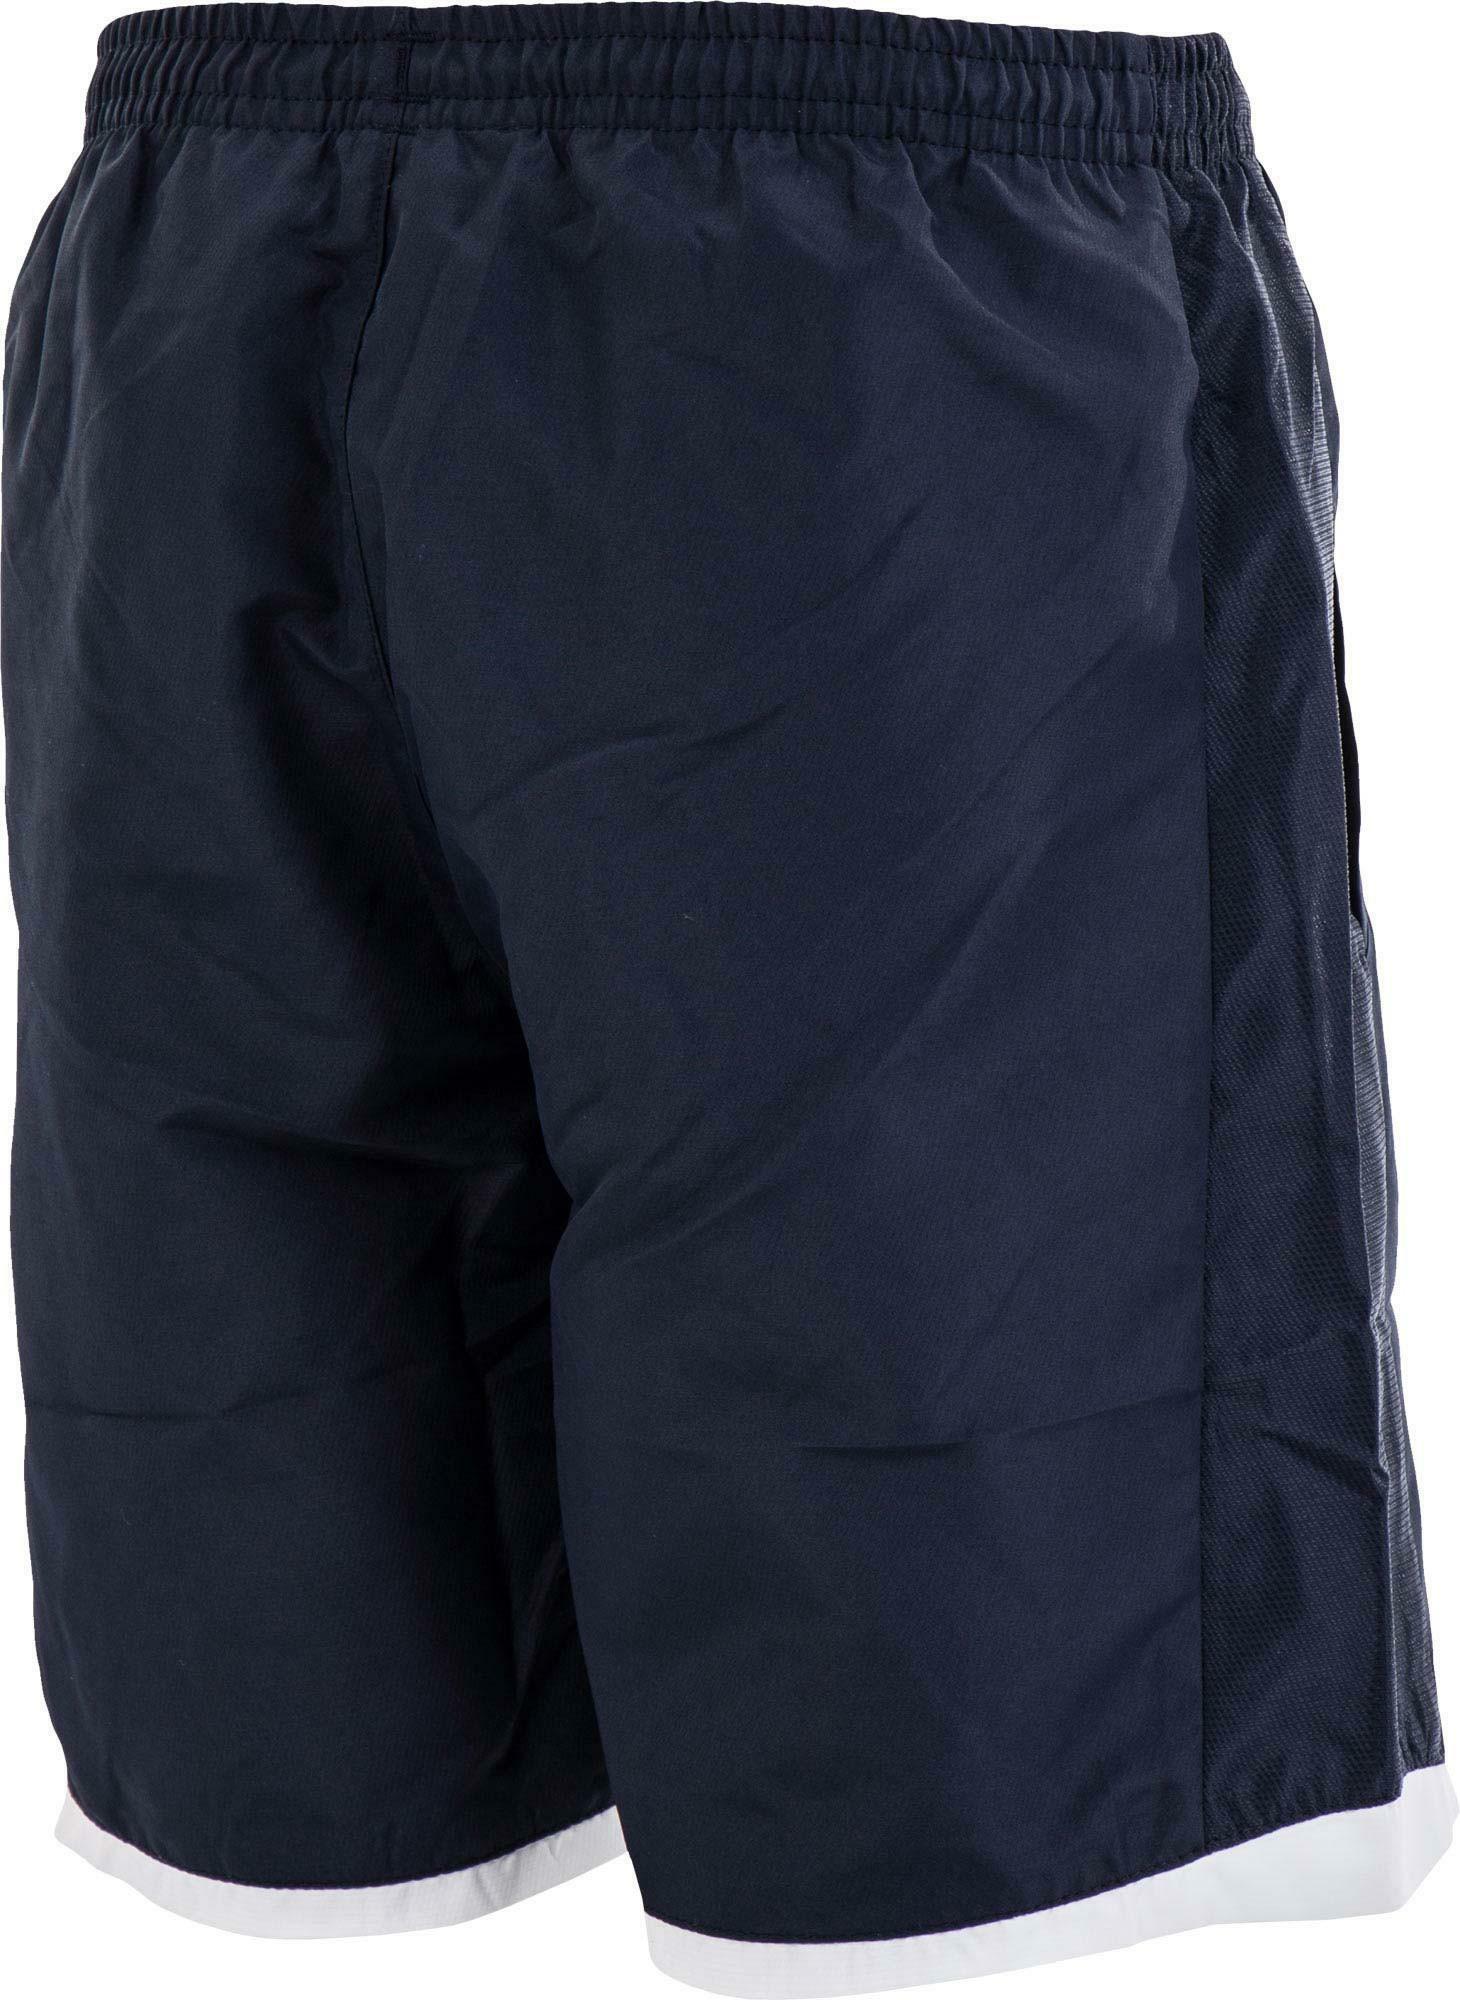 lotto lotto aydex ii short pantaloncini bambino blu s1308